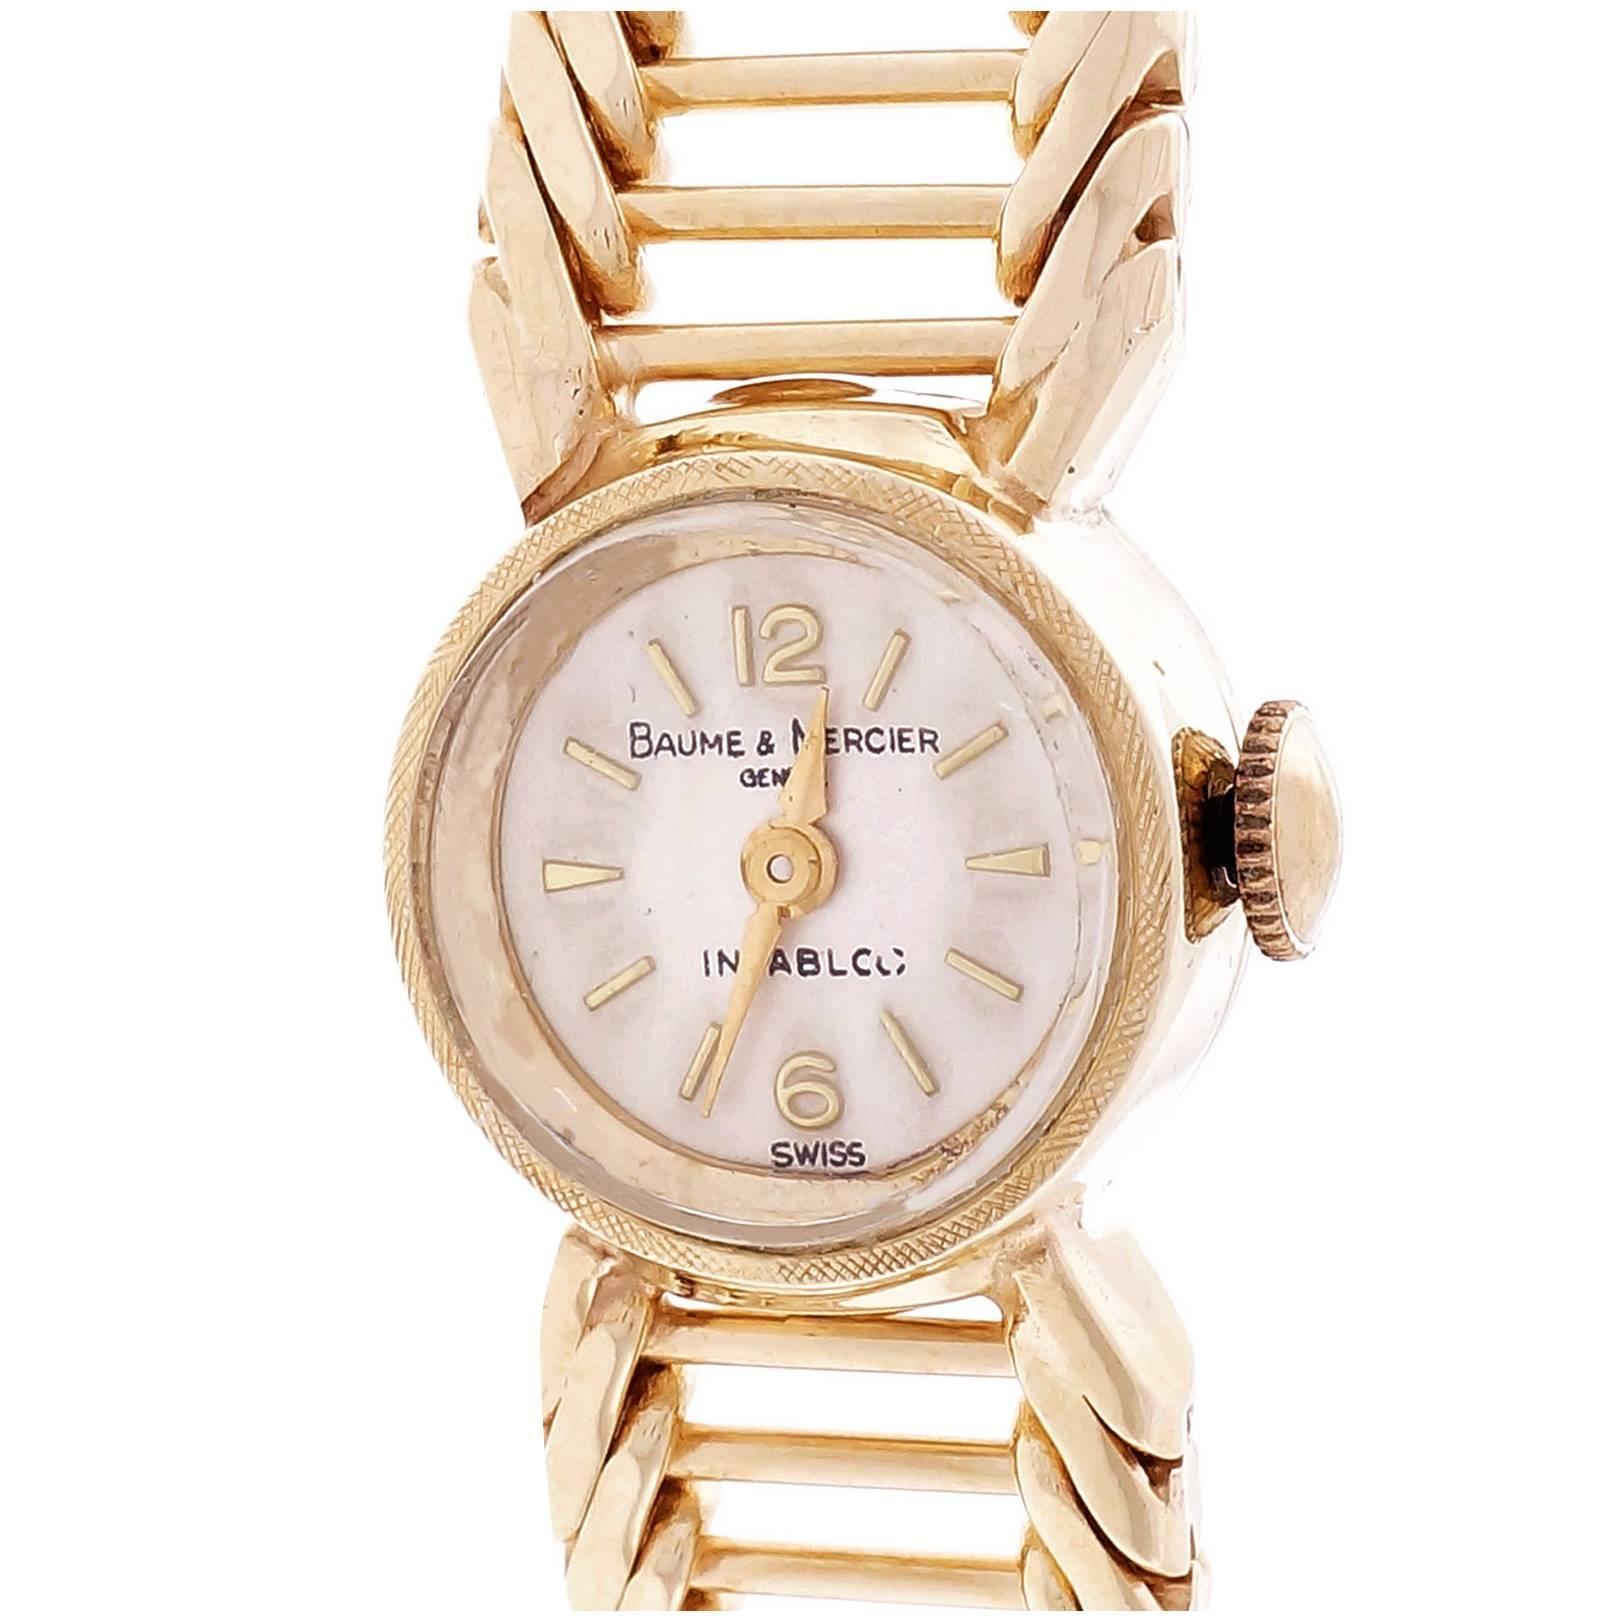 Baume & Mercier Ladies Yellow Gold Manual Wind Wristwatch